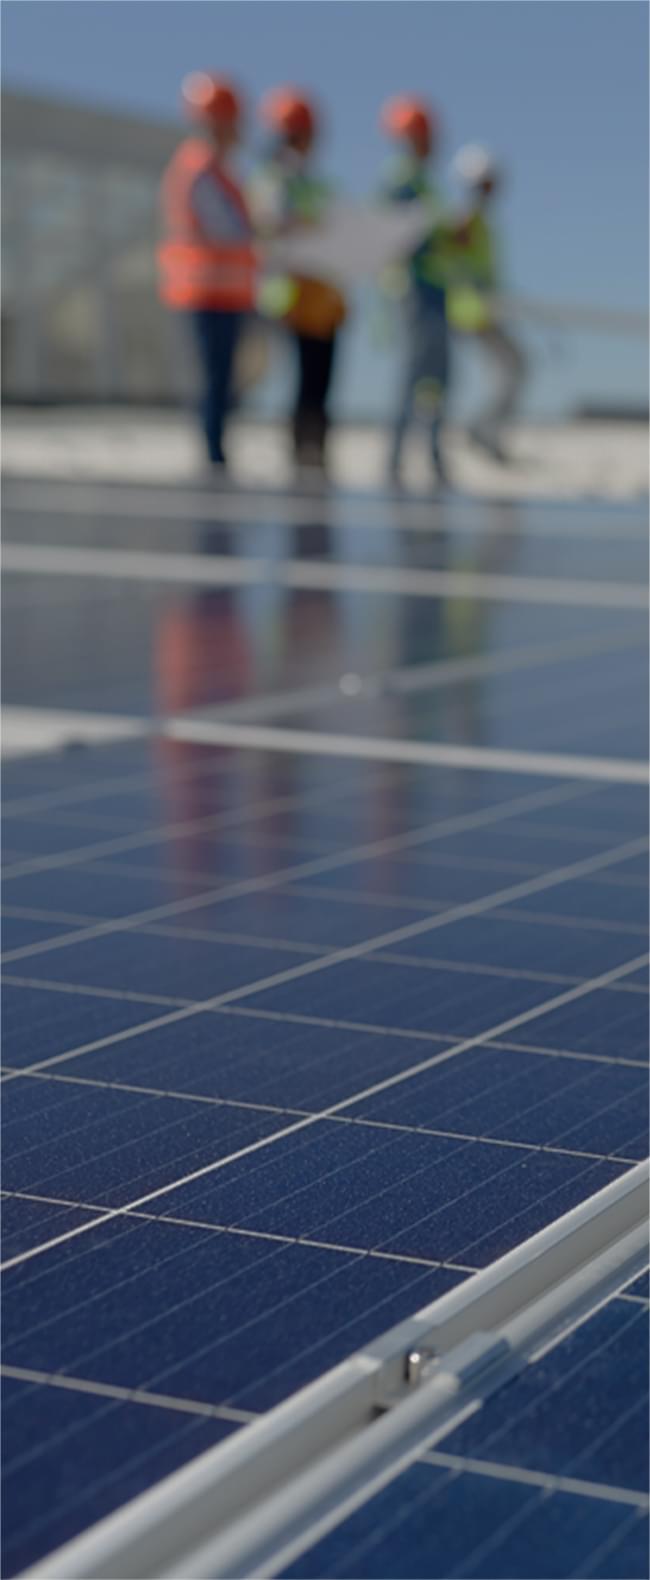 National Grid employees installing solar panels